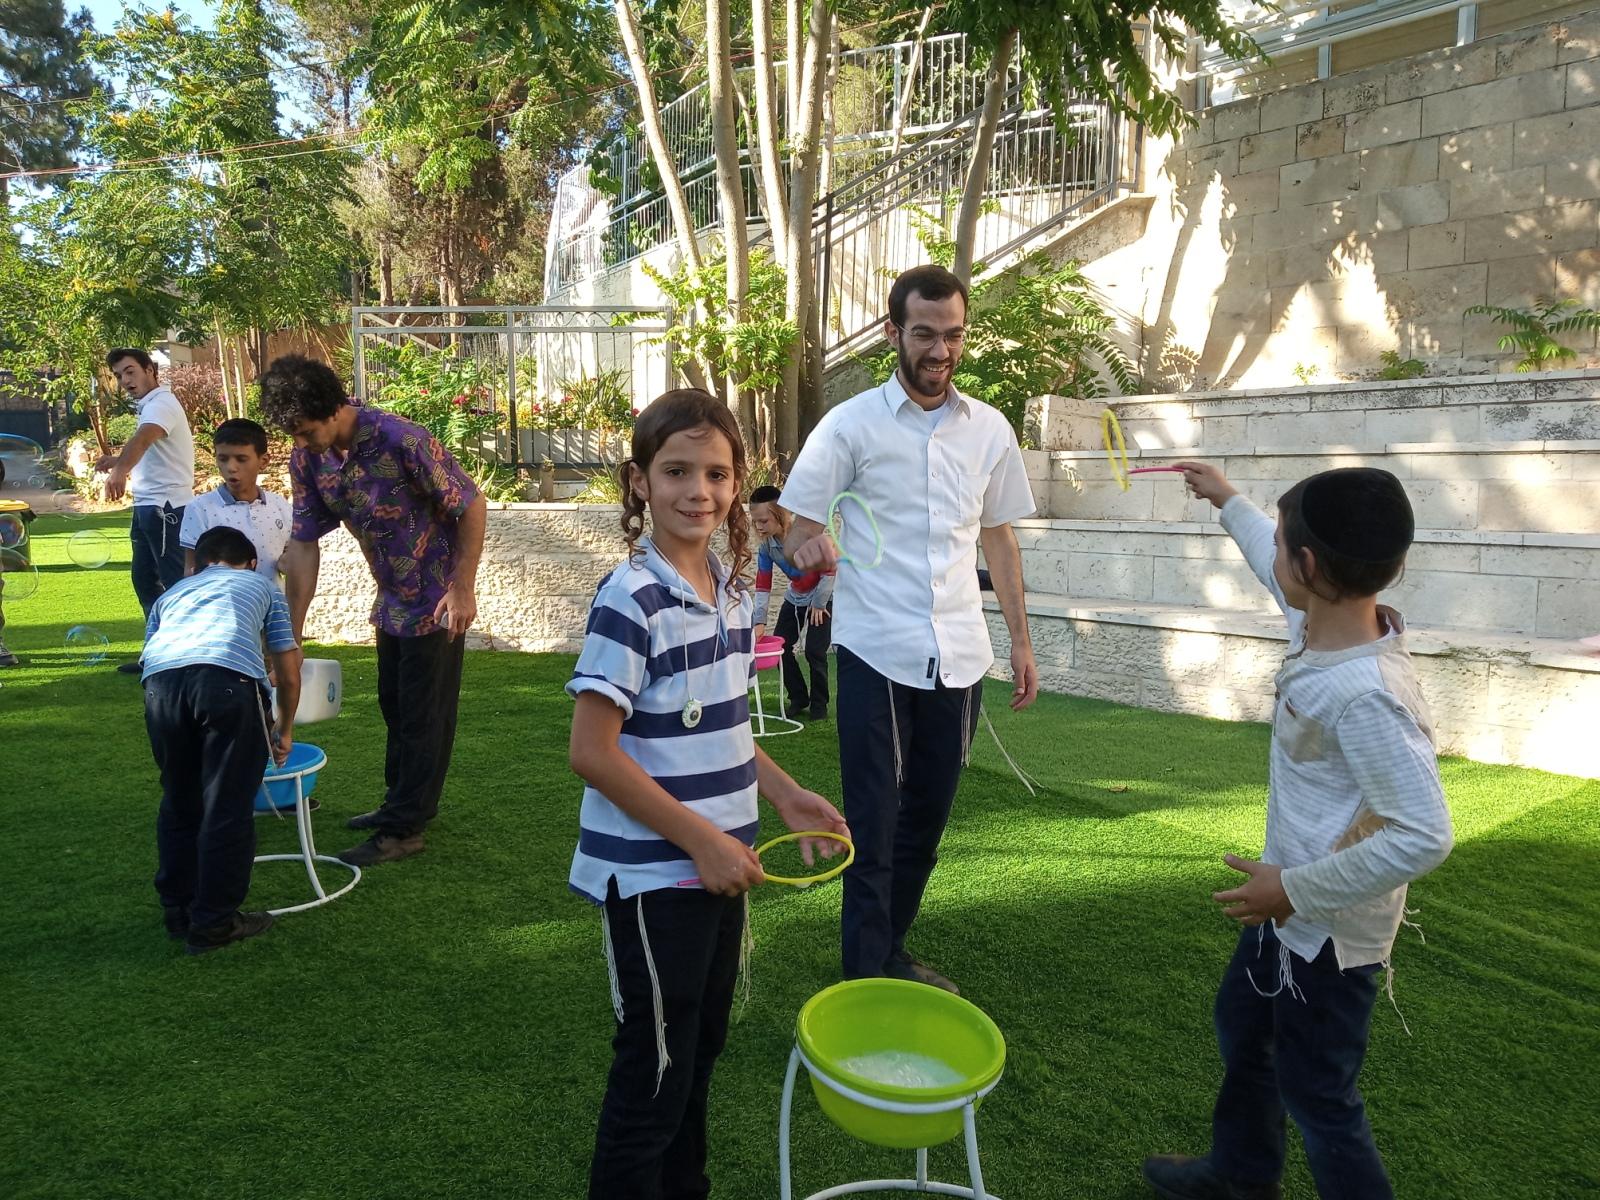 Summer at Sanhedria 2021